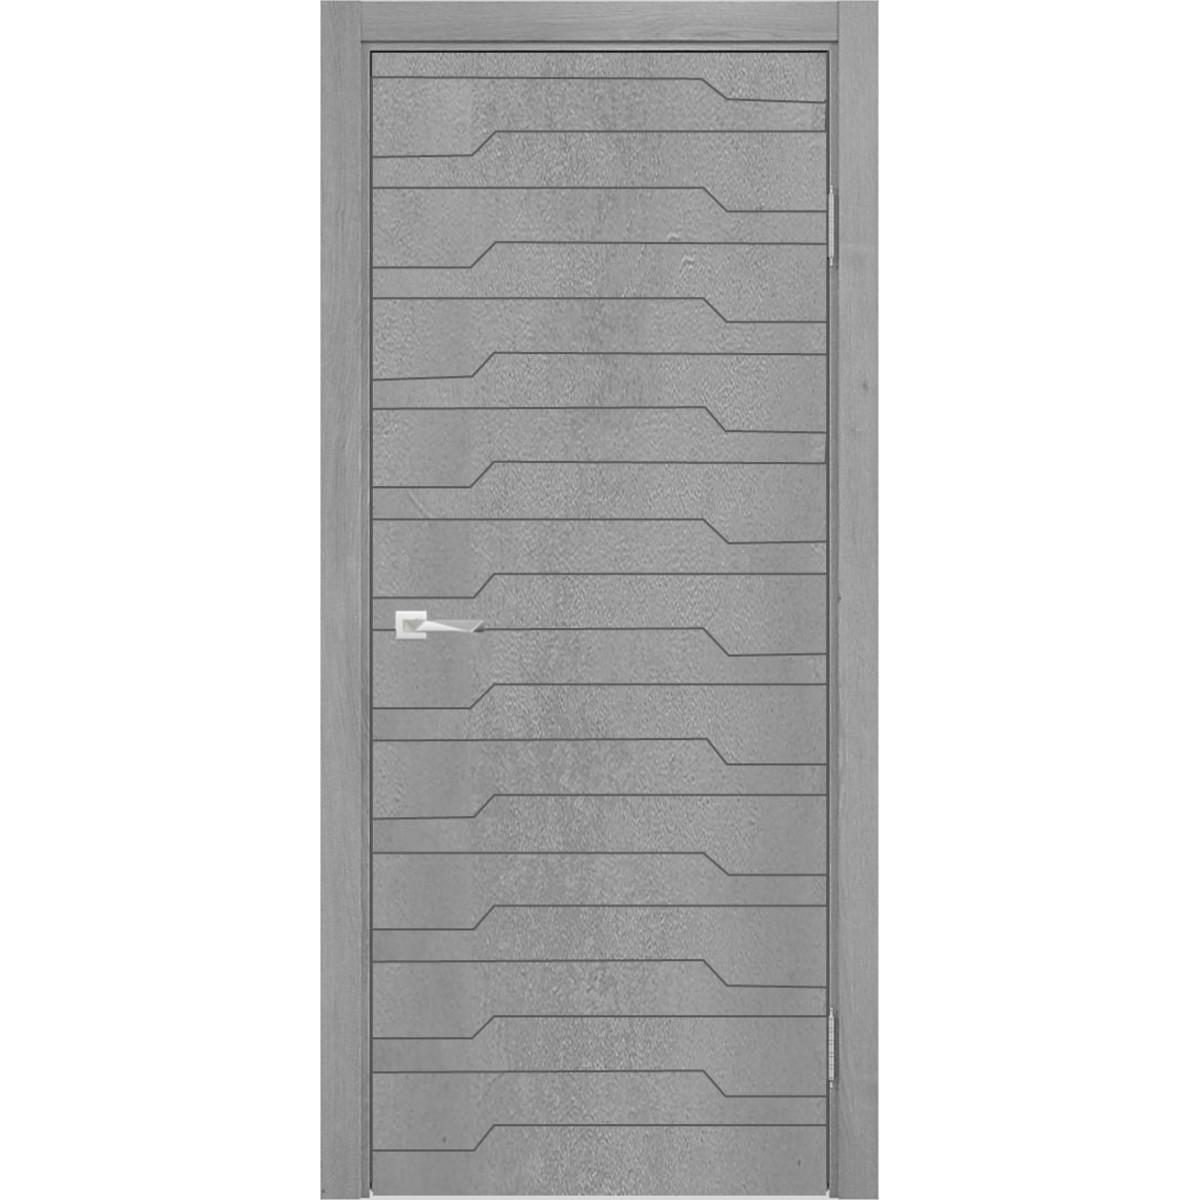 Дверное полотно Loyard Севилья МП_0387 2000х900х44 мм МДФ